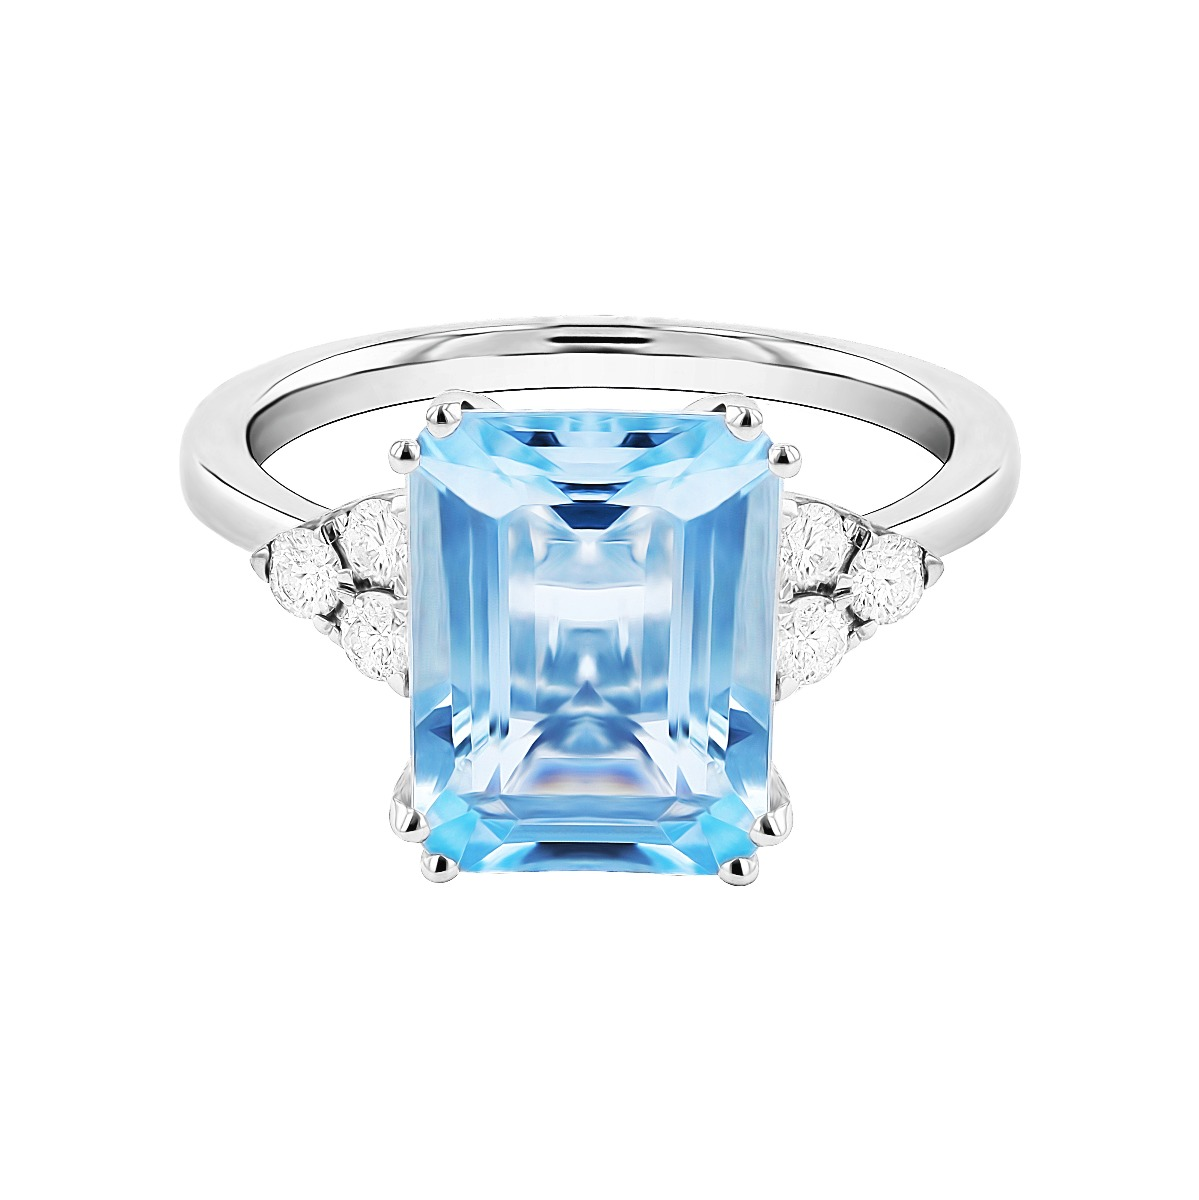 Rosa Mer Collection 3.39ct Aquamarine & Diamond Ring